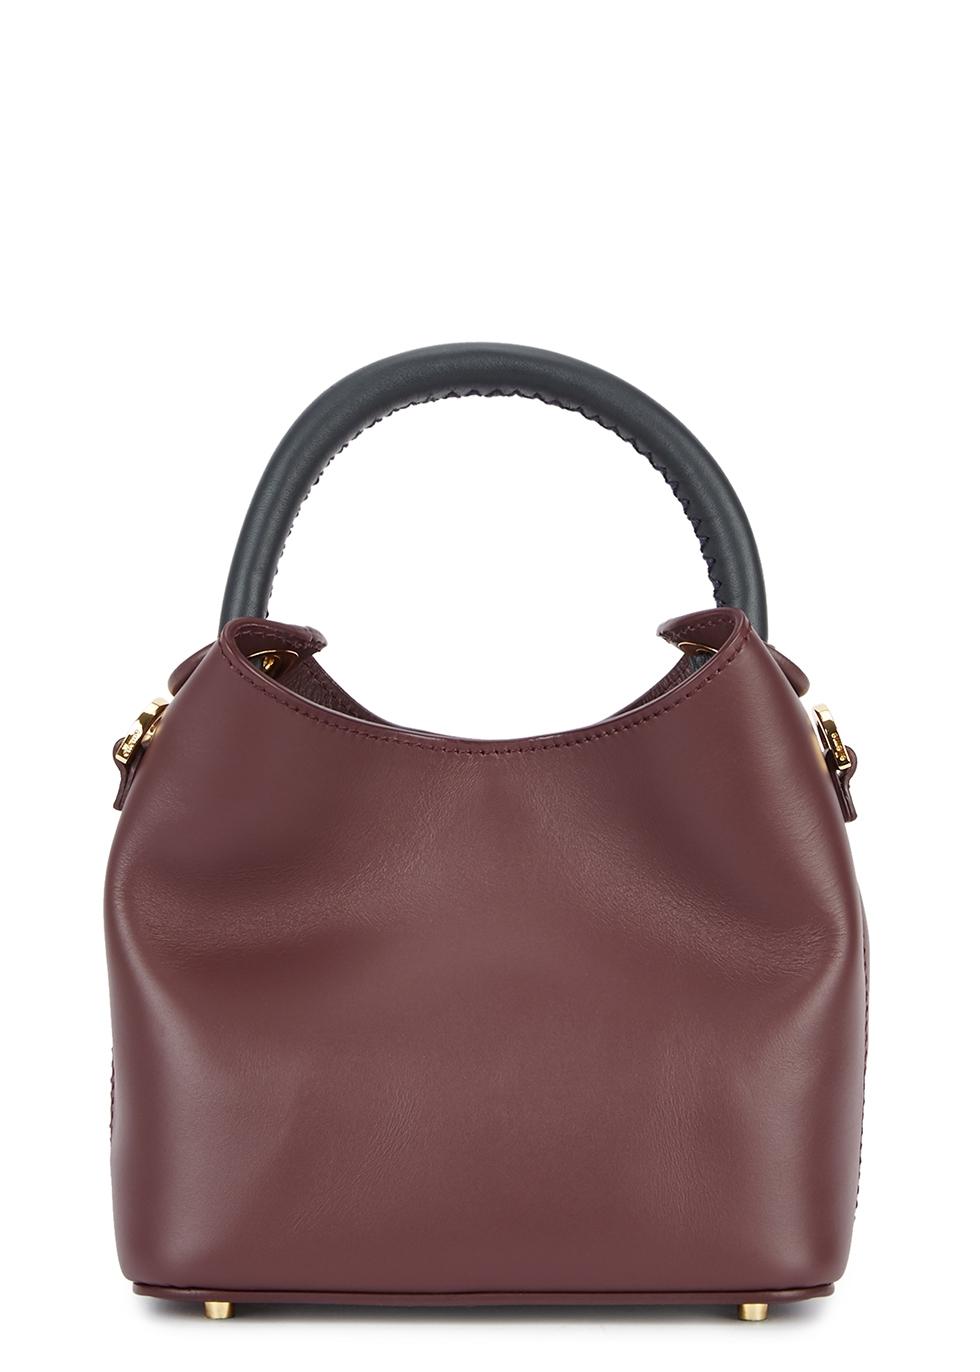 ELLEME Madeleine Mini Leather Cross-Body Bag in Burgundy